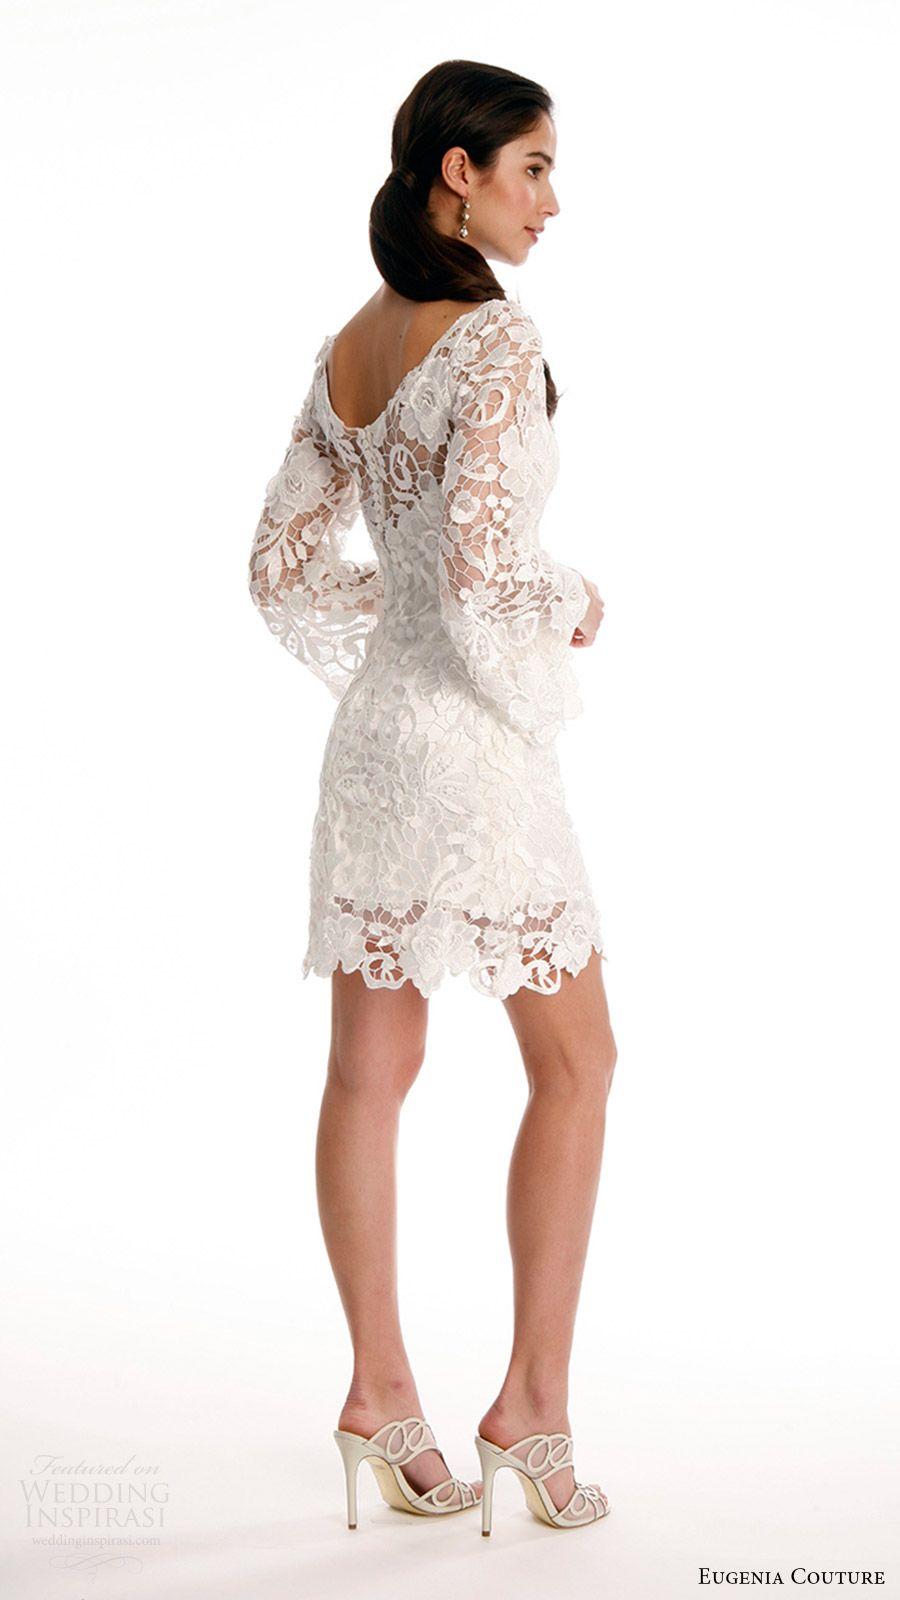 Eugenia Couture Spring 2017 Wedding Dresses Joy Bridal Collection Wedding Inspirasi Short Wedding Dress Short Wedding Dress Vintage Wedding Dresses [ 1600 x 900 Pixel ]